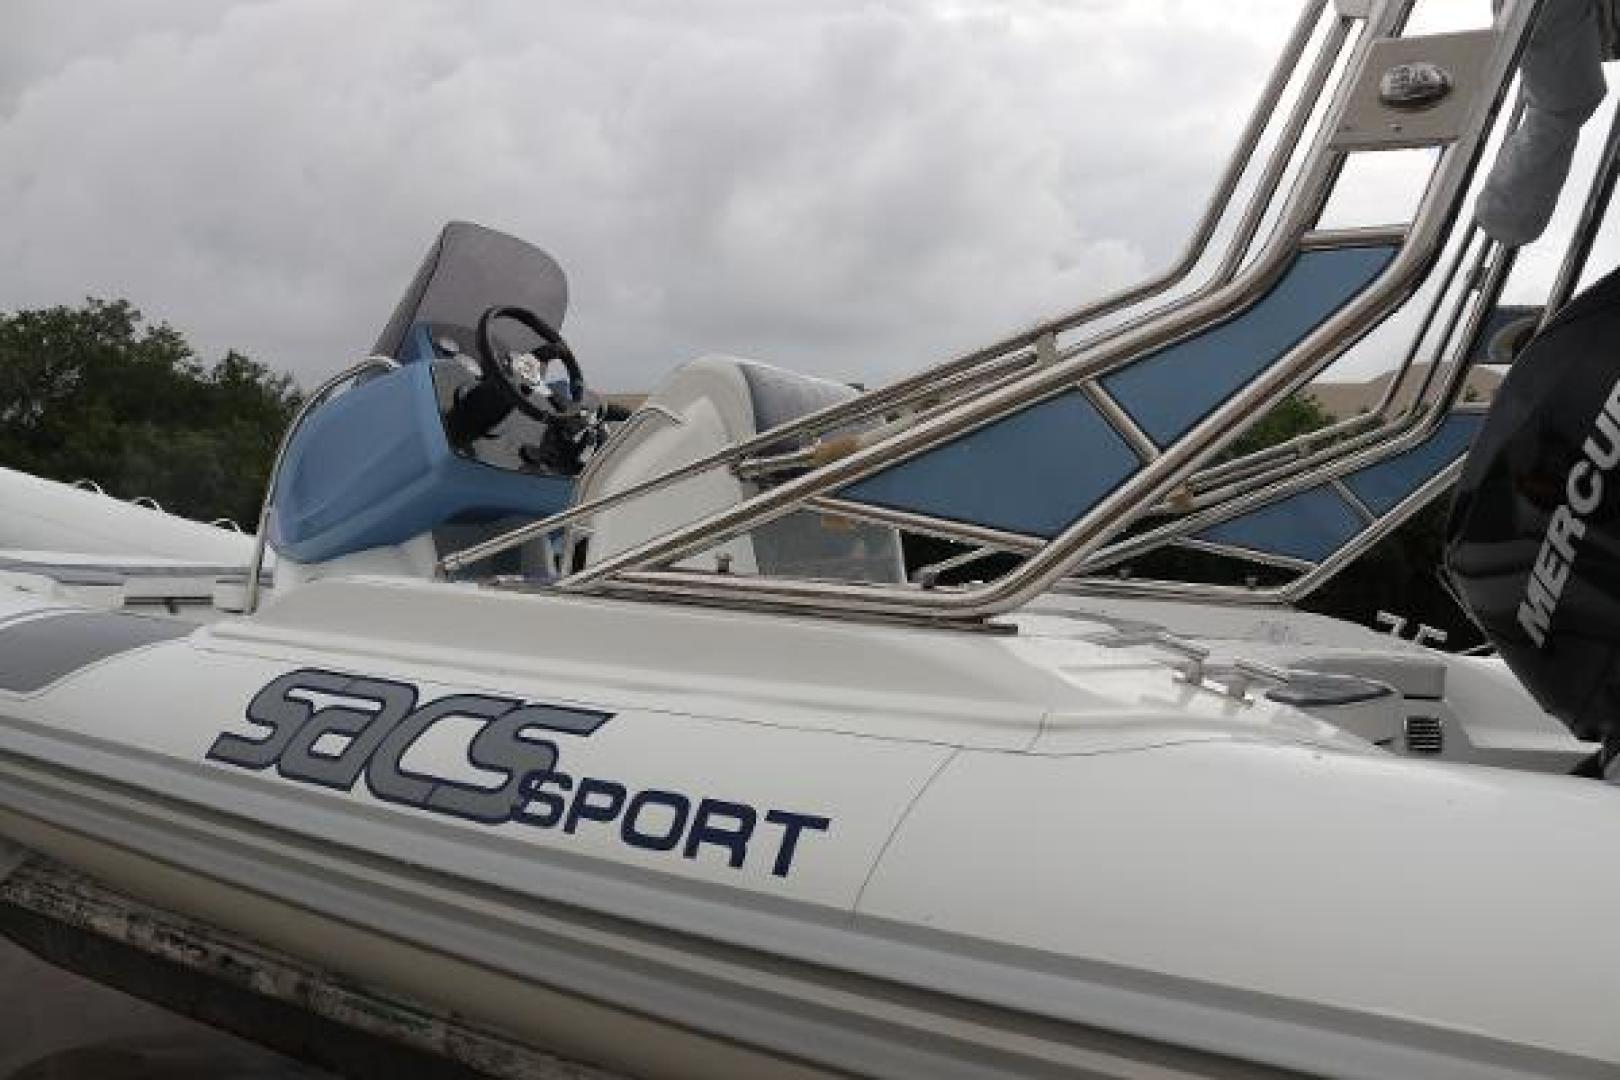 Sacs-Sport 700 2016-Sacs Sport 700 Fort Lauderdale-Florida-United States-1521580 | Thumbnail